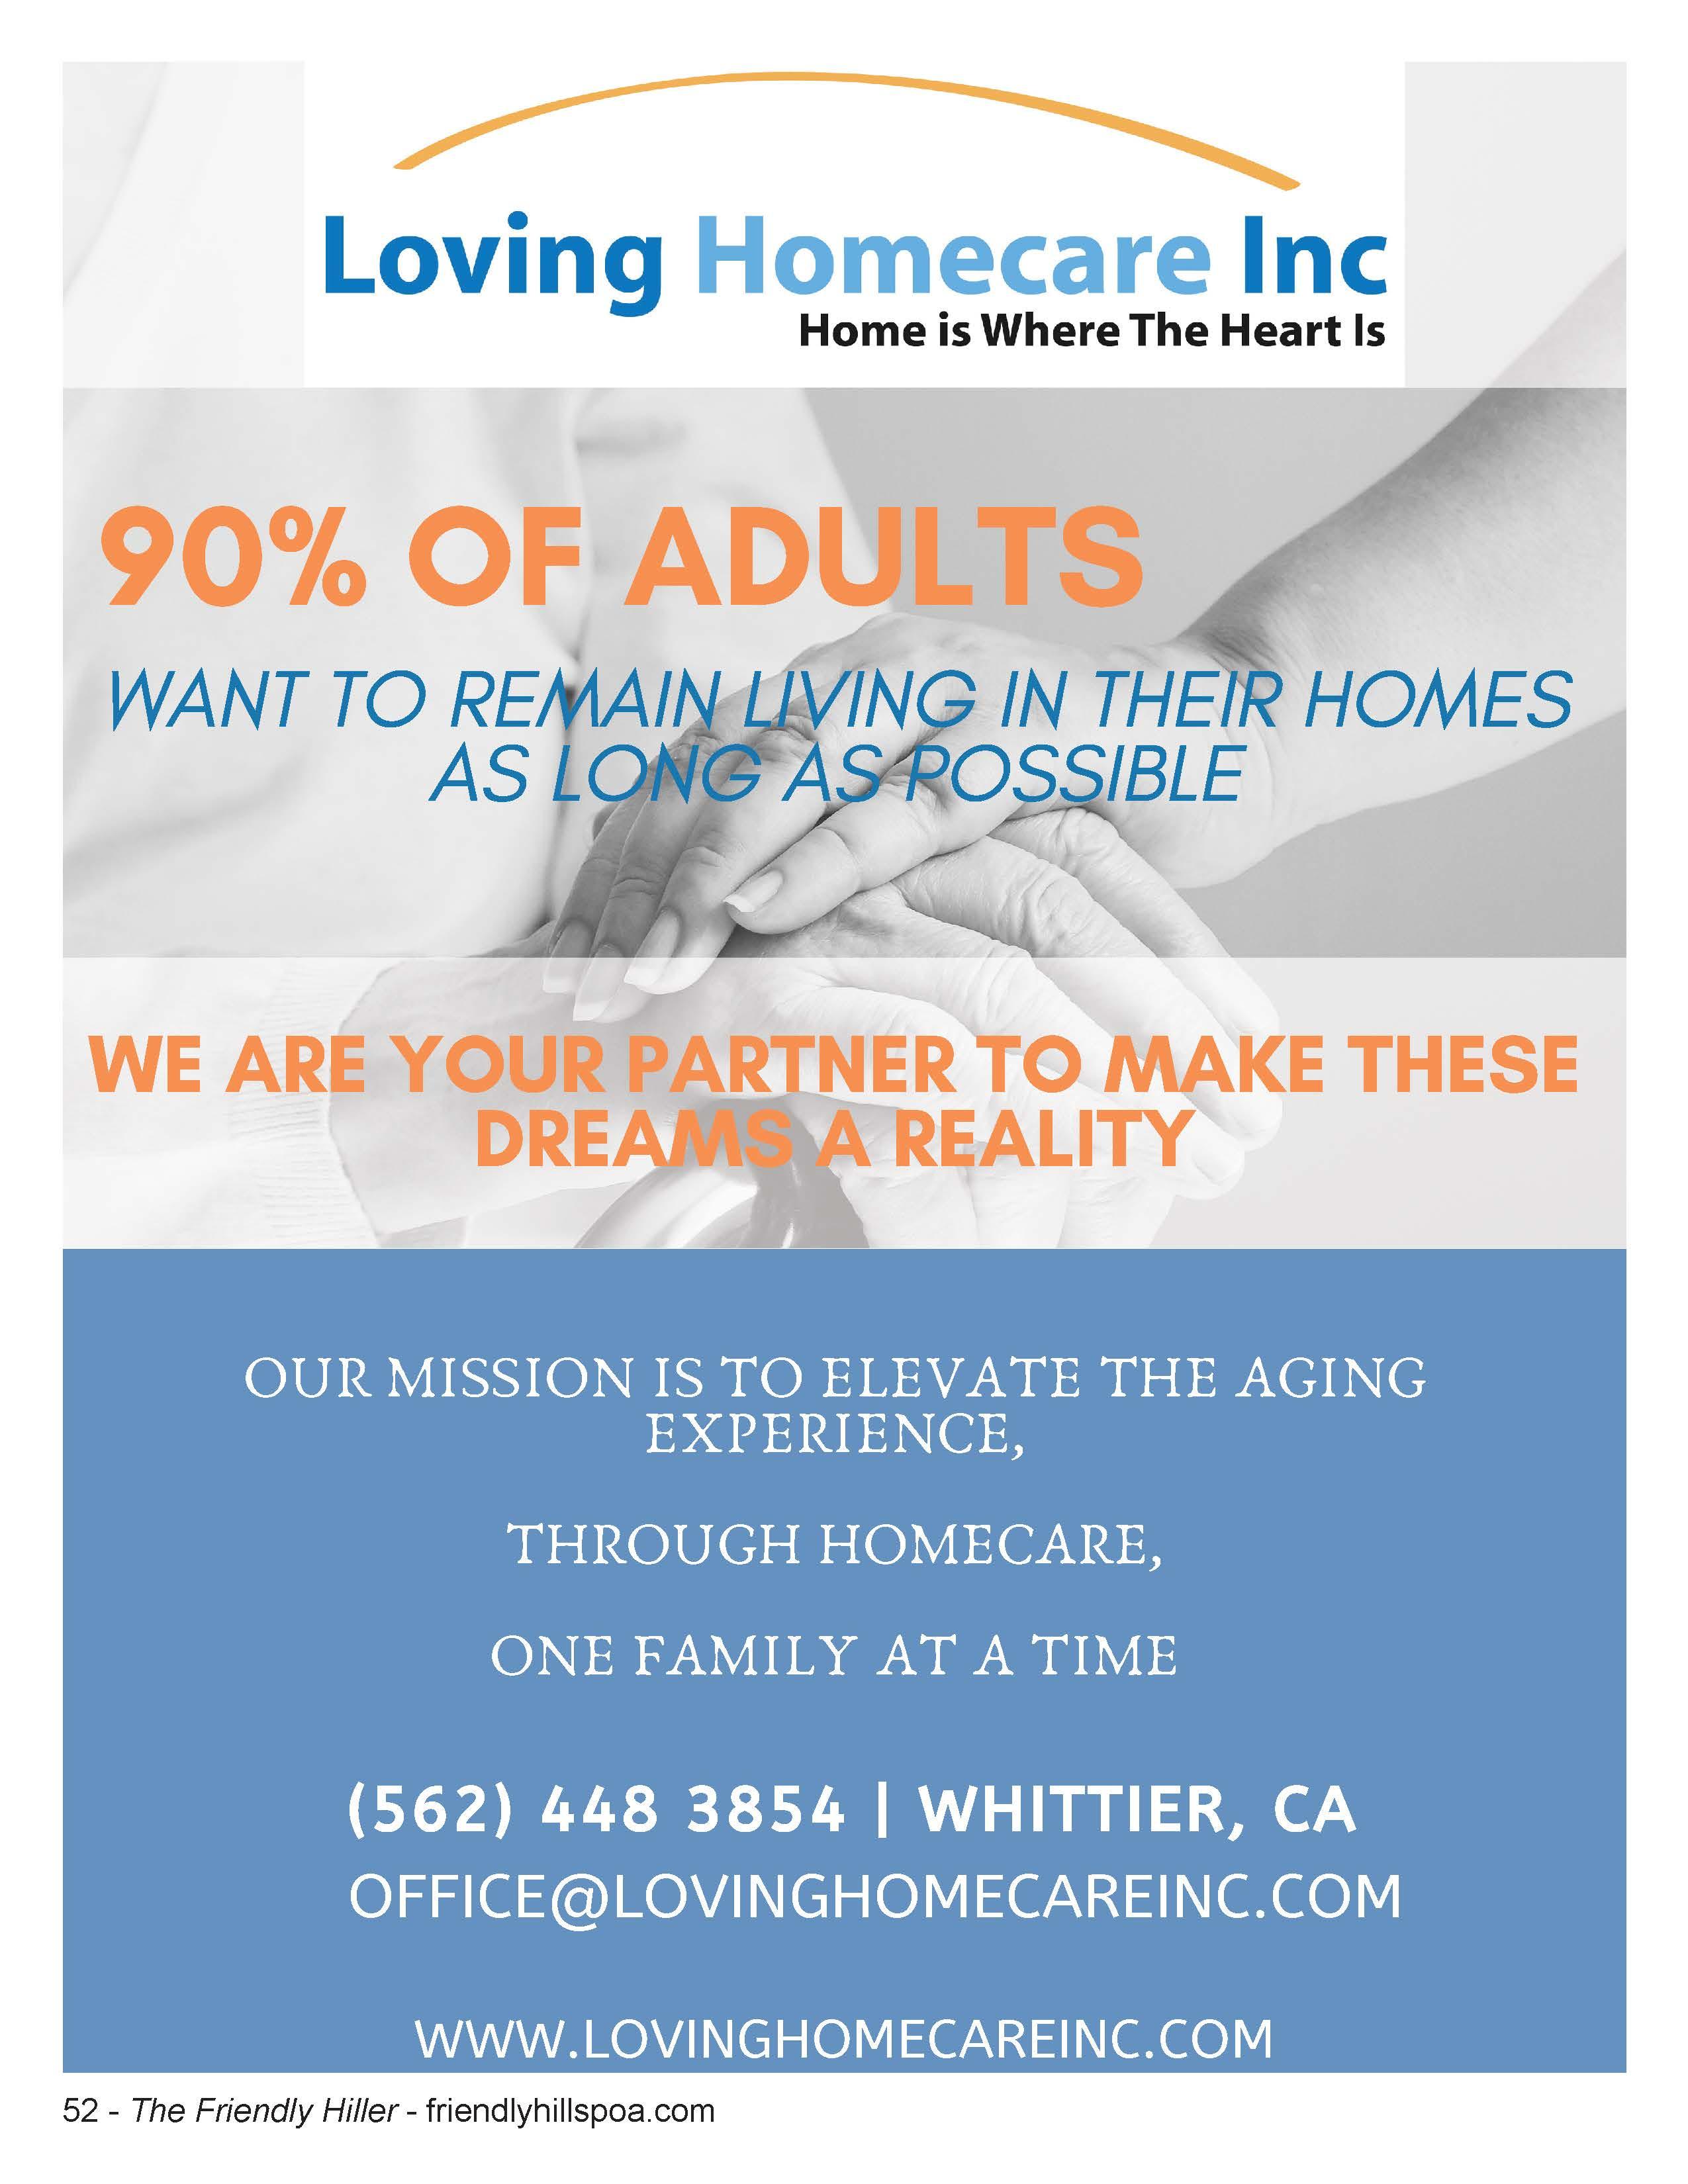 Loving Homecare Inc